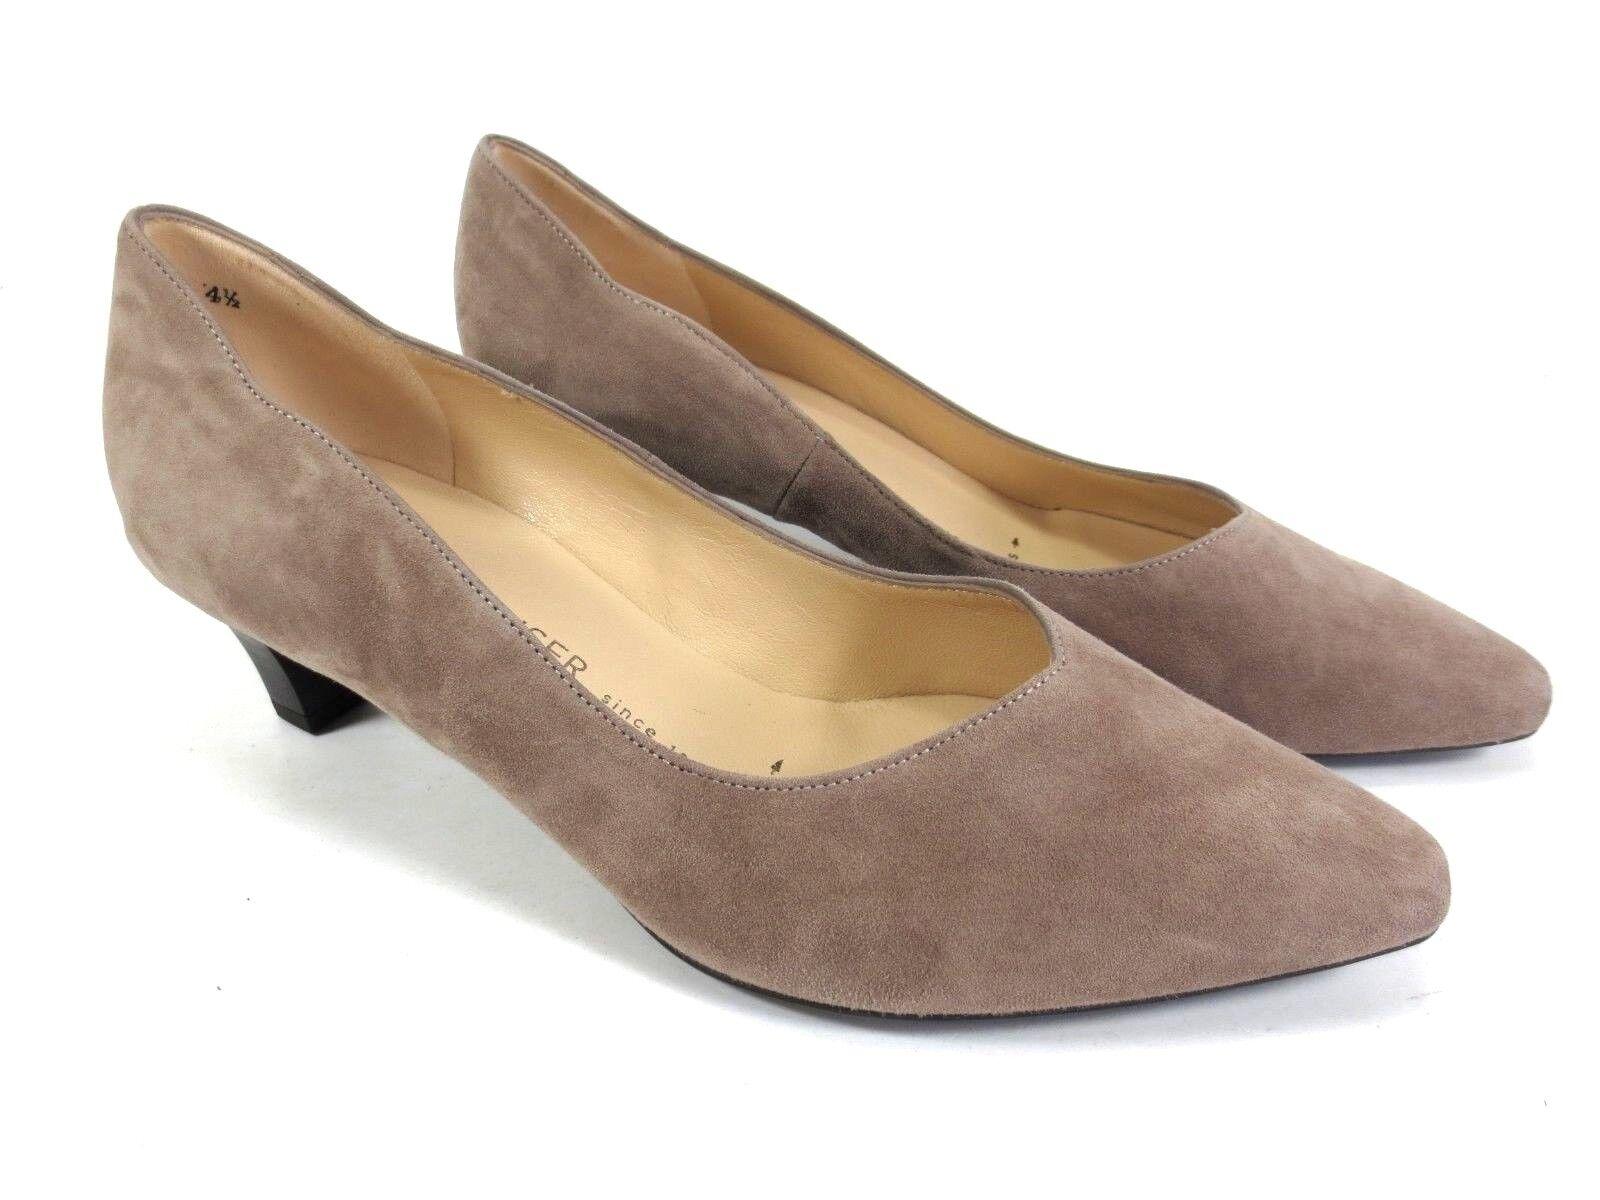 migliore offerta Peter Kaiser plus pelle scarpe décolleté Beige Taupe Taupe Taupe Nuovo UVP 129,95  basta comprarlo